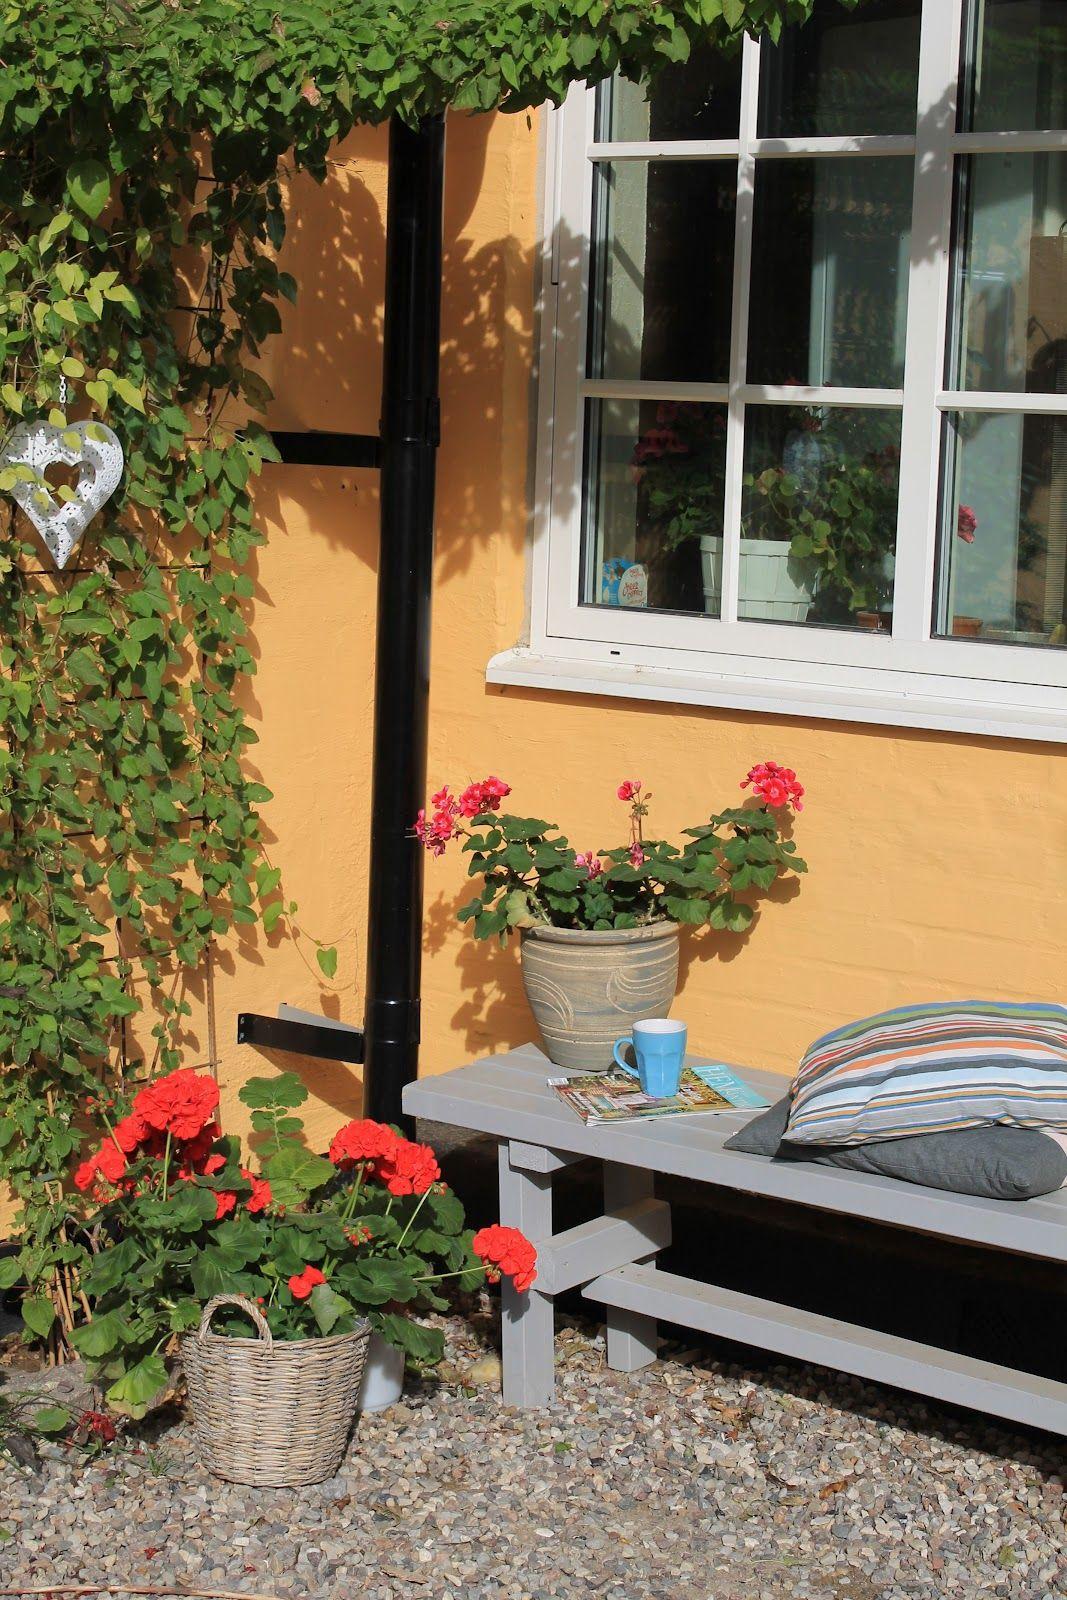 Outdoor reading nook (myfinnishdelights blog) | Outdoor ... on Backyard Nook Ideas id=43158